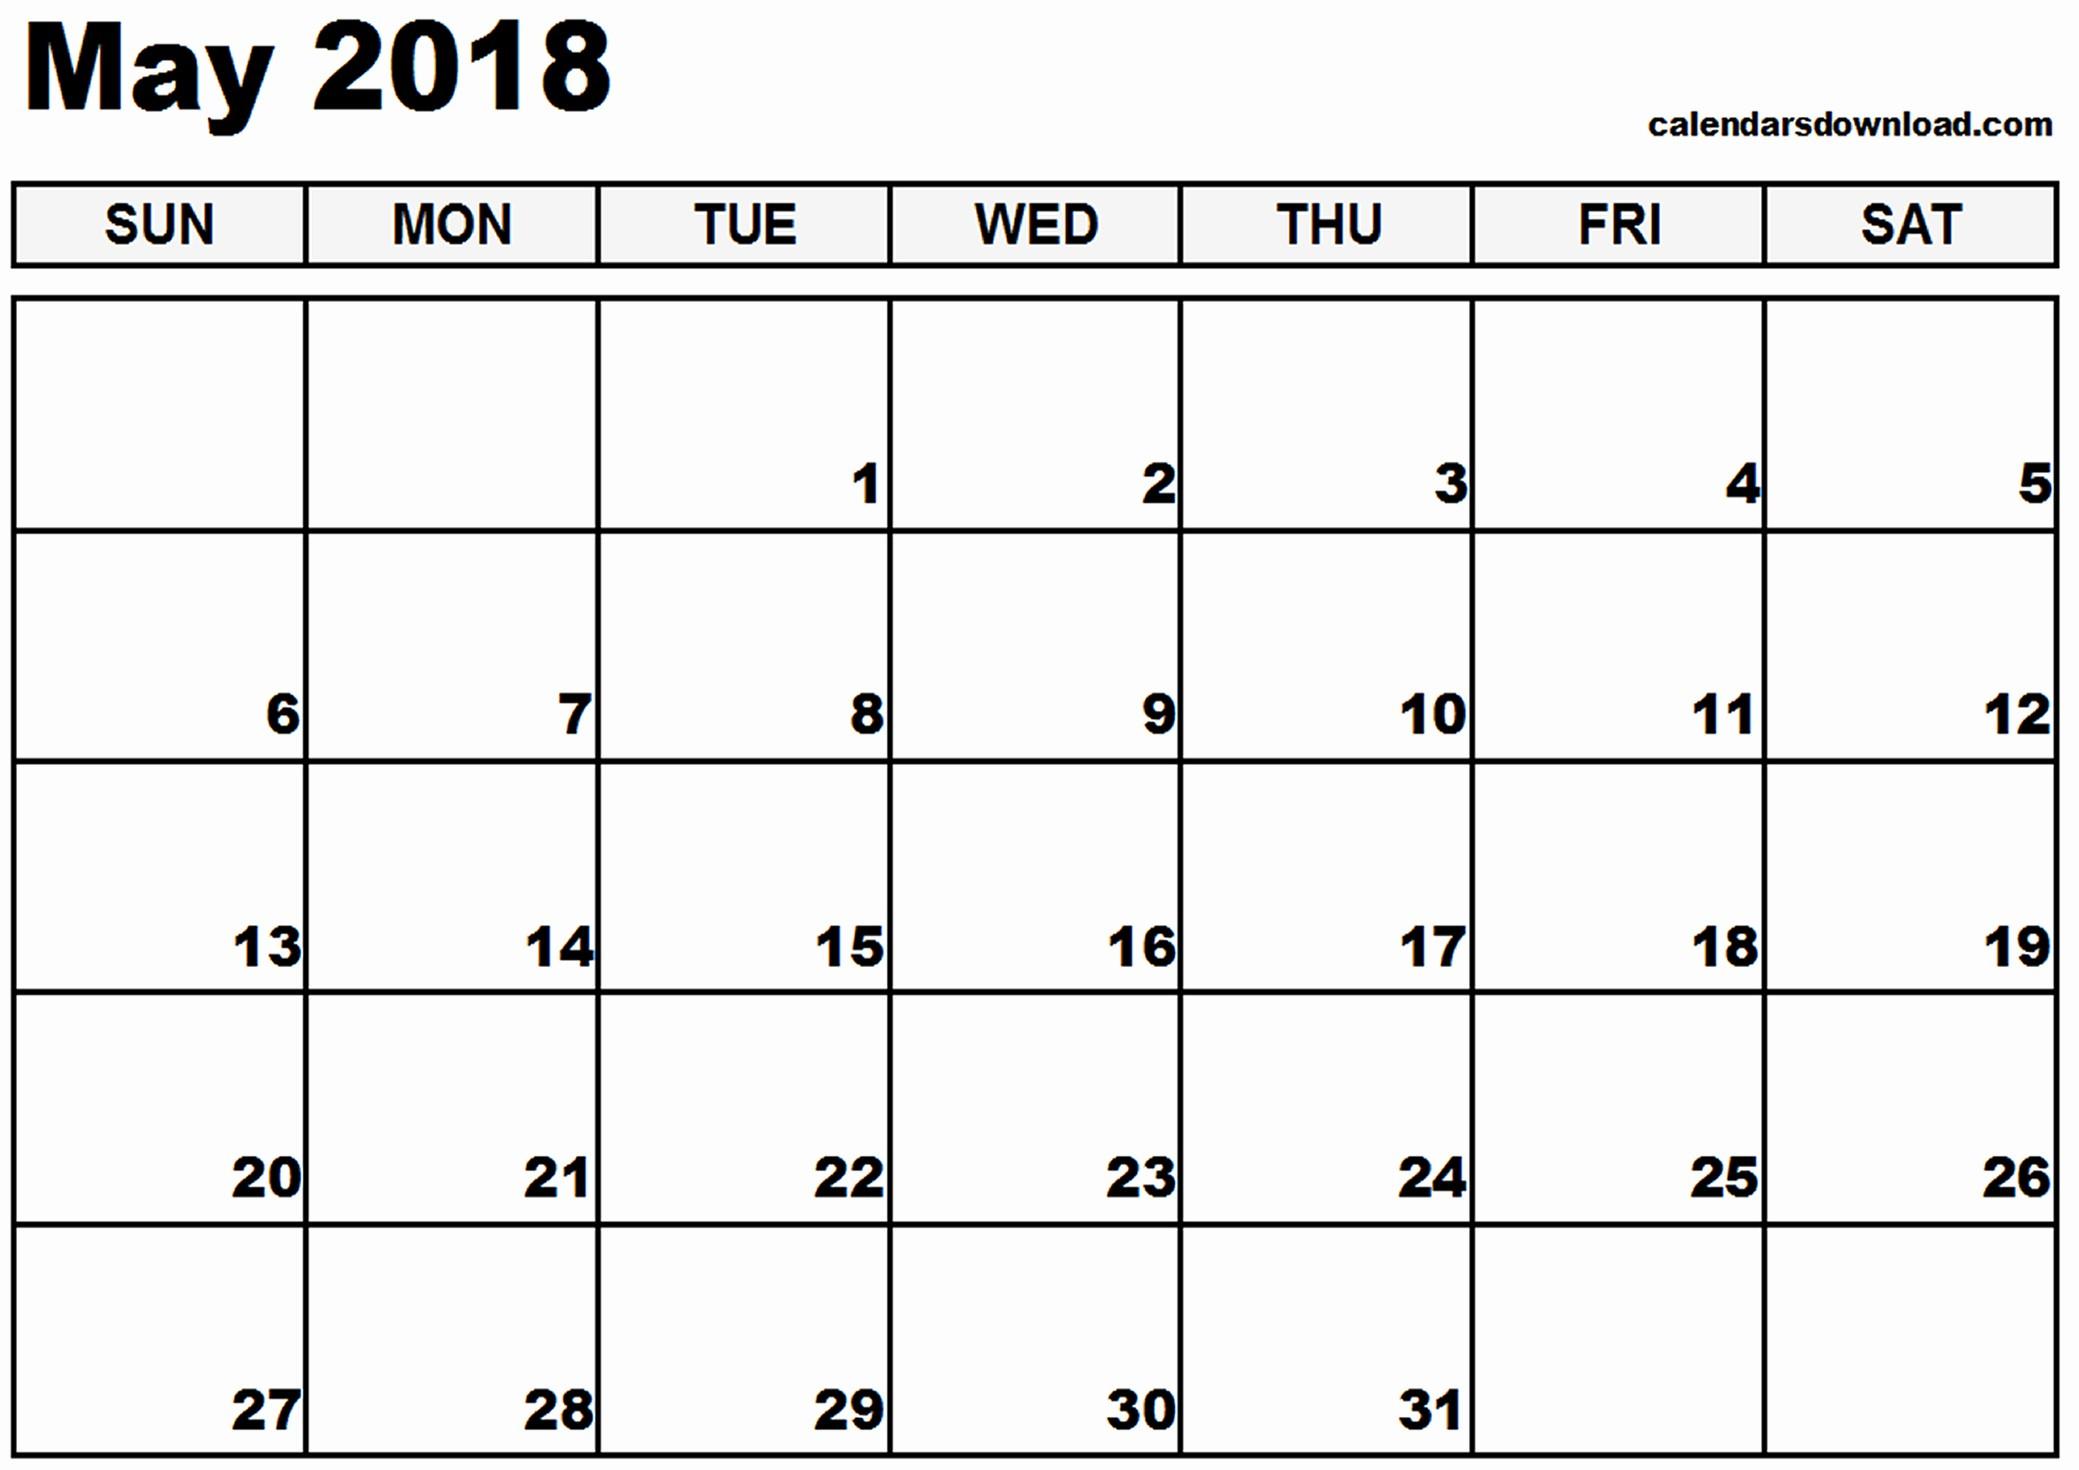 Blank May 2018 Calendar Printable Luxury May 2018 Printable Calendar